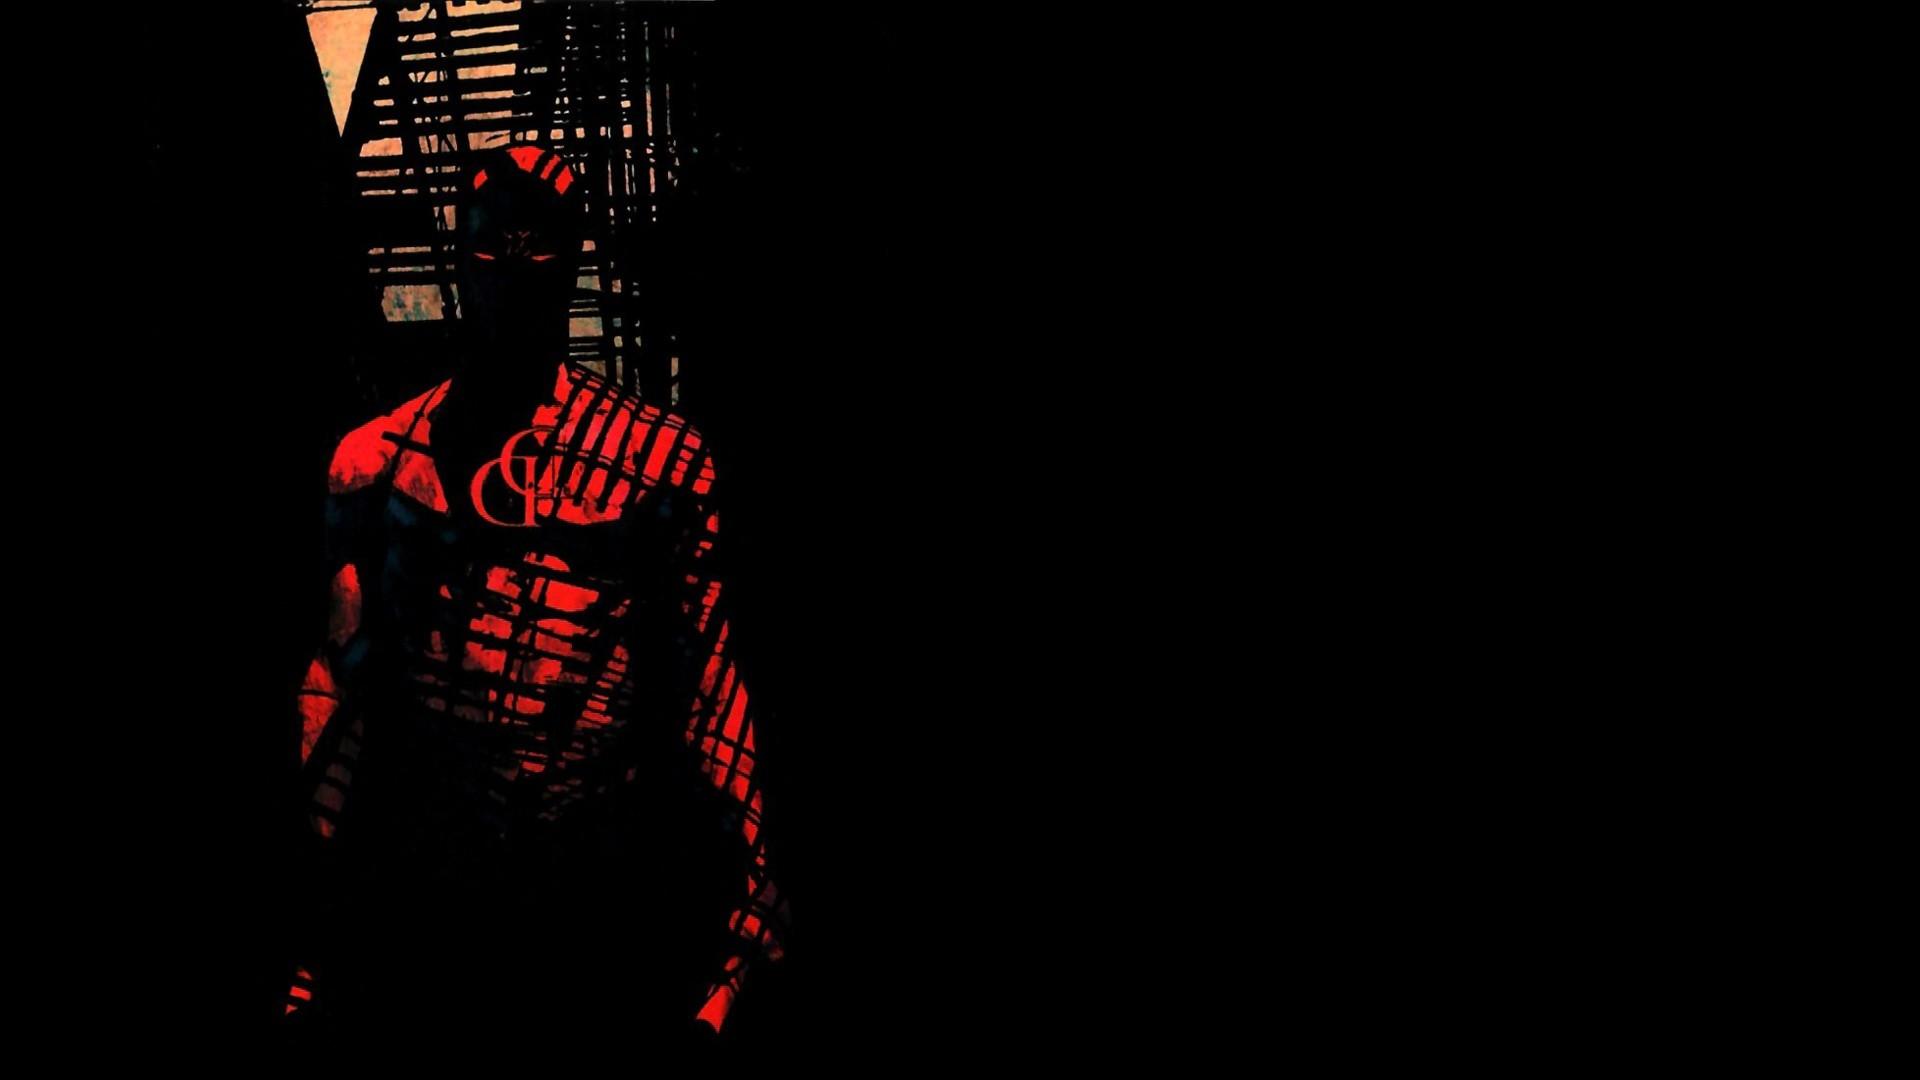 Daredevil Netflix Movie Wallpapers   Download Free Desktop Wallpaper .